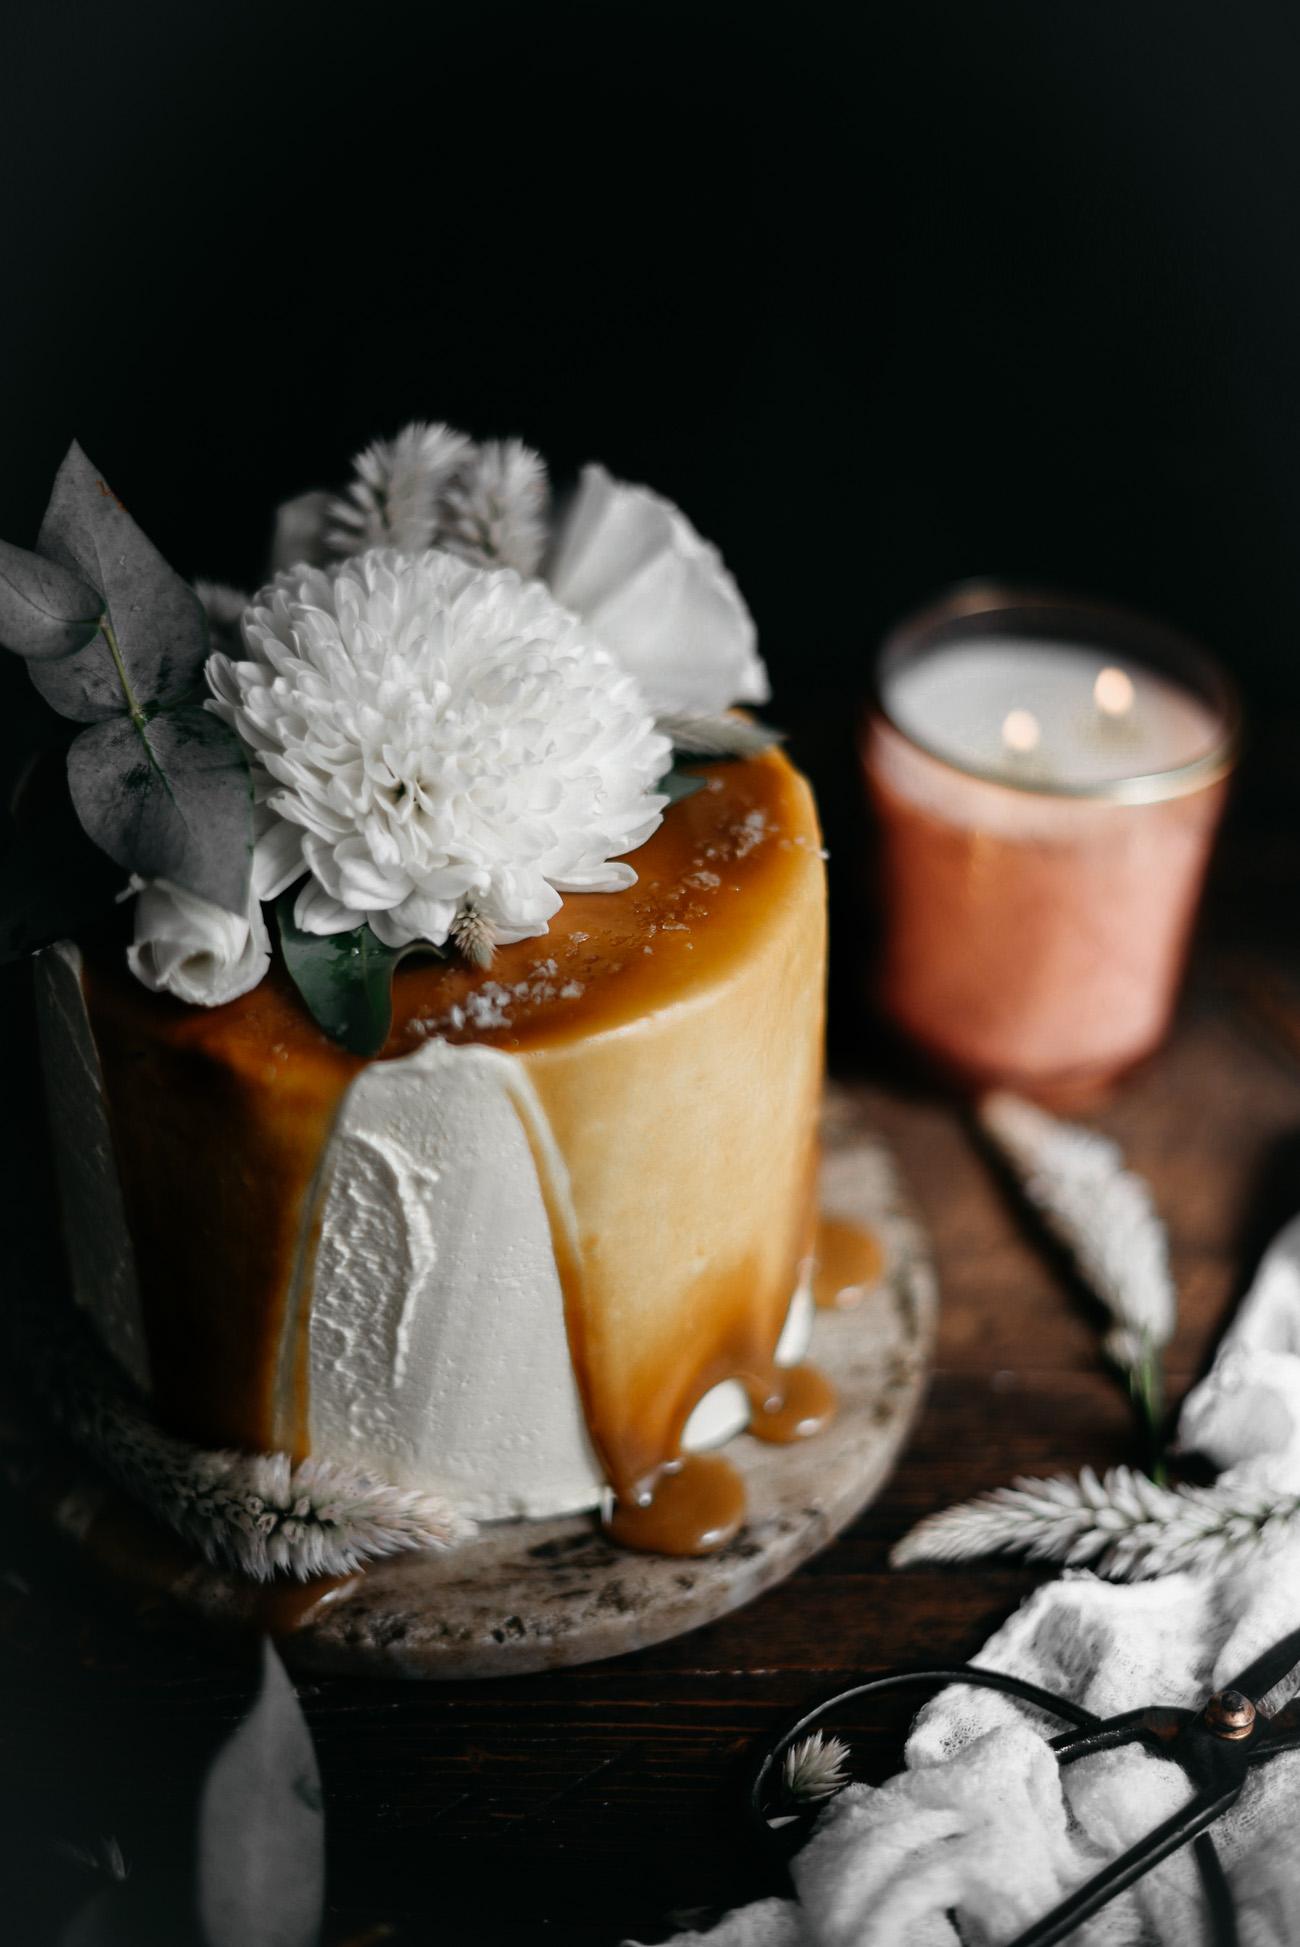 Italian-Orange-Blossom-and-Almond-Cake-with-Orange-Curd-Mascarpone-Swiss-Meringue-Buttercream-and-Fleur-d'Oranger-Caramel-12.jpg